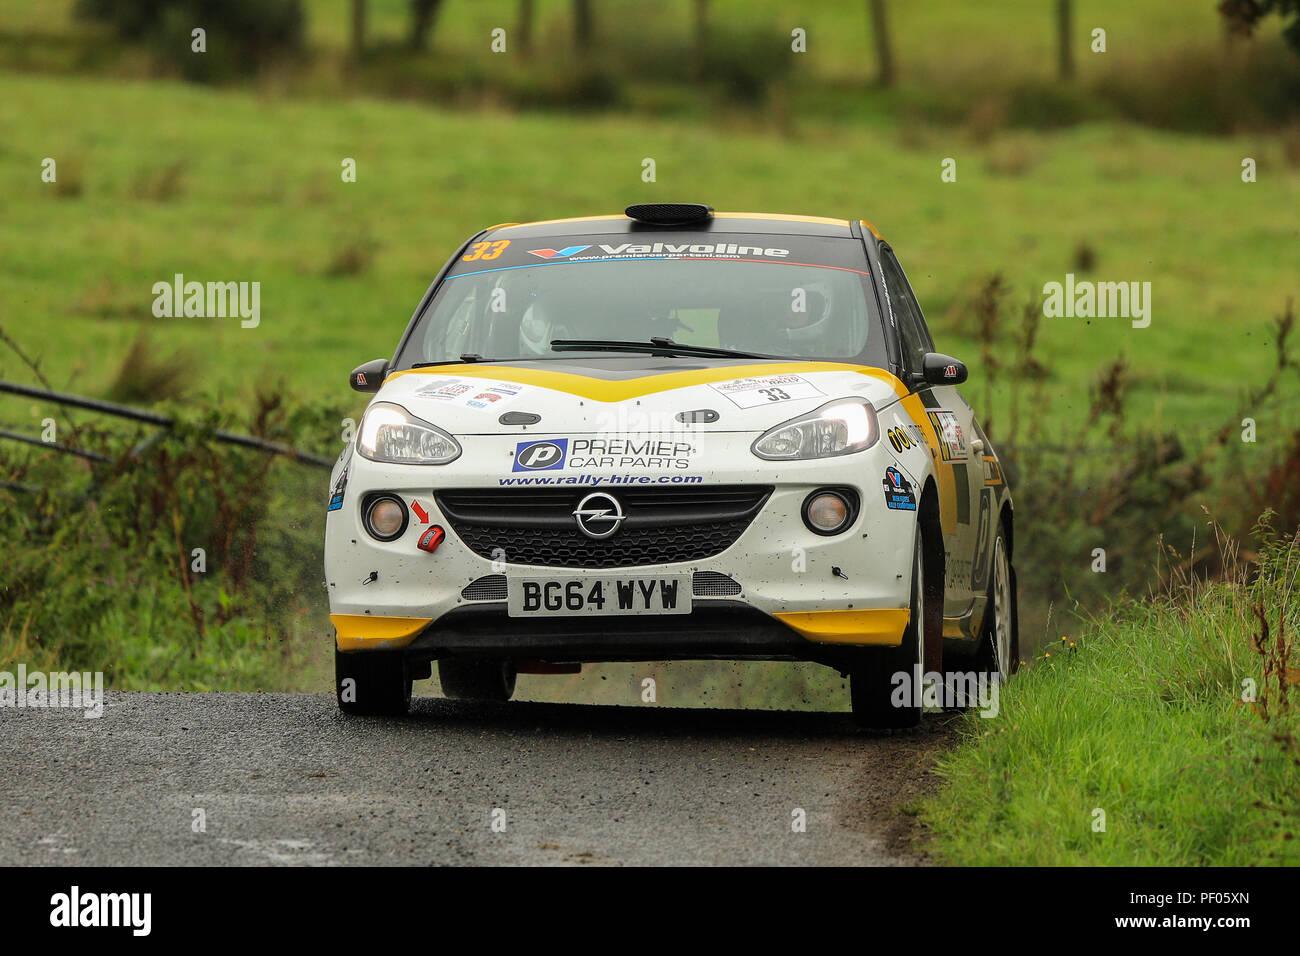 Rally Motor Credit >> County Antrim Northern Ireland 18th Aug 2018 John Mulholland